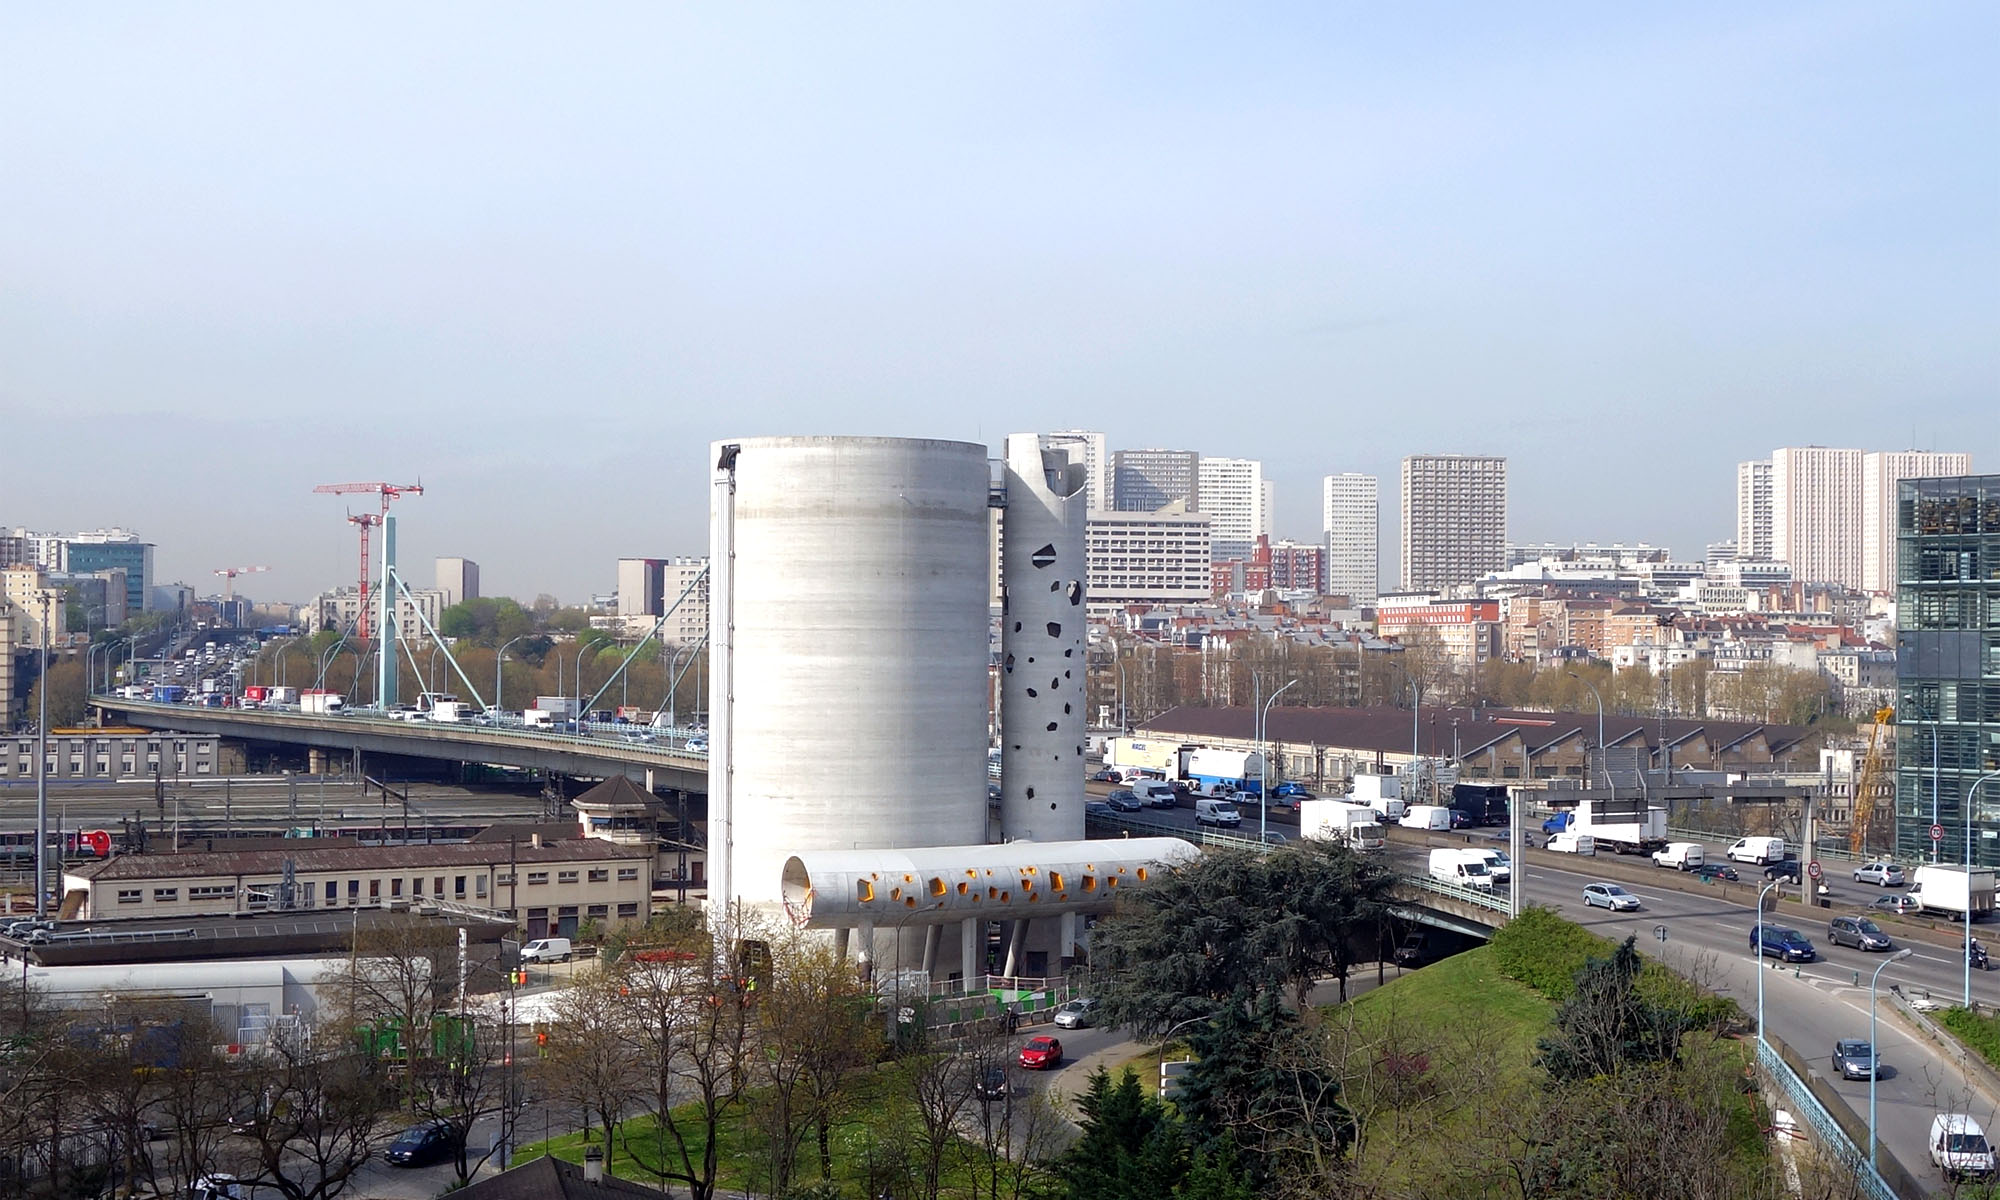 vib.silos13.perrault.1000.contrast